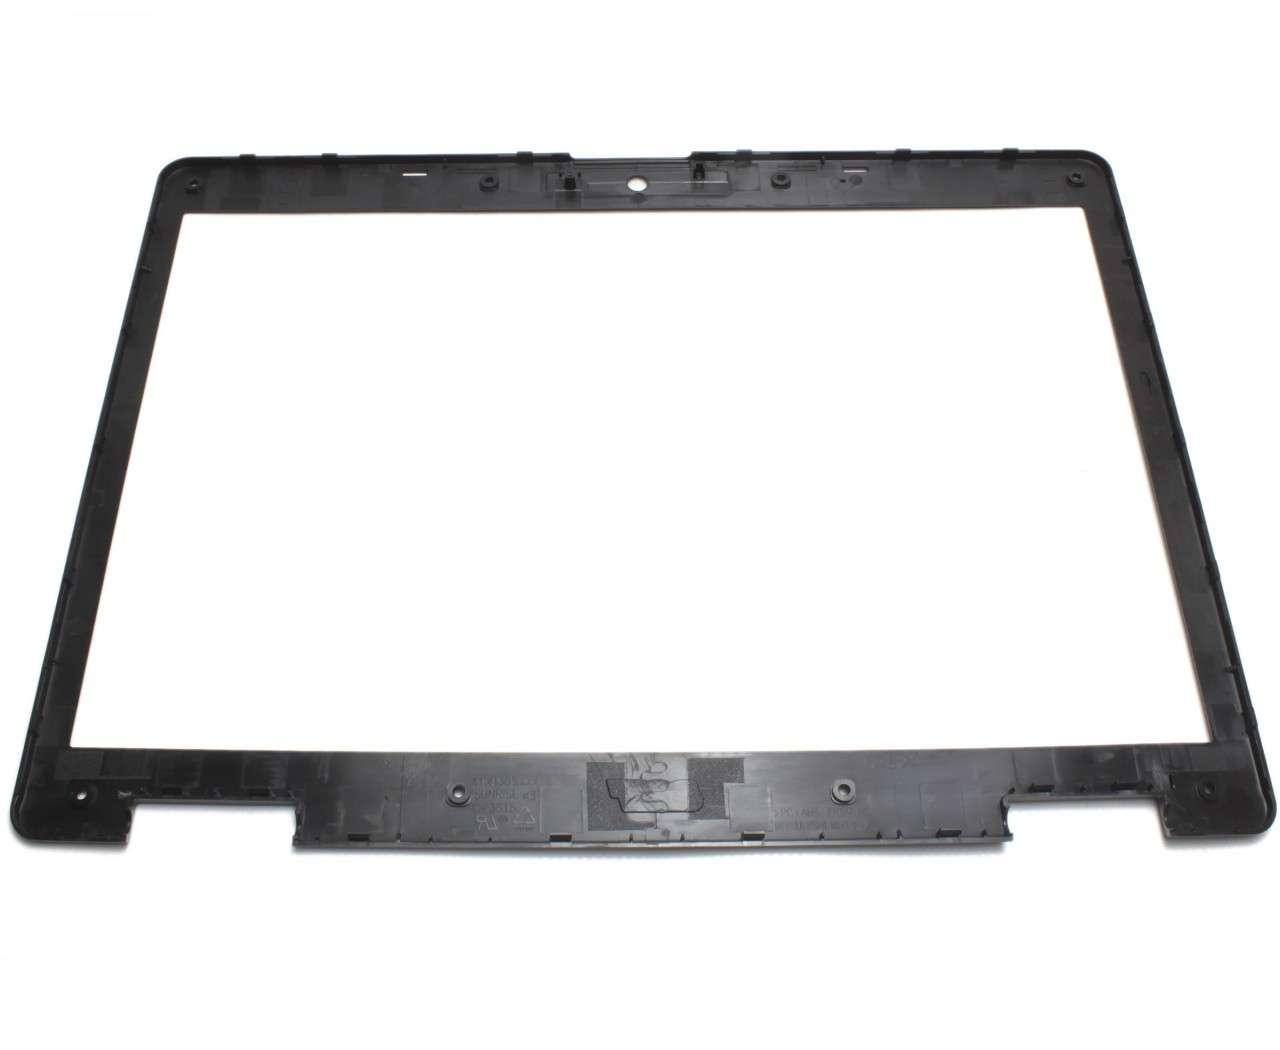 Rama Display Acer TravelMate 5310 Bezel Front Cover Neagra imagine